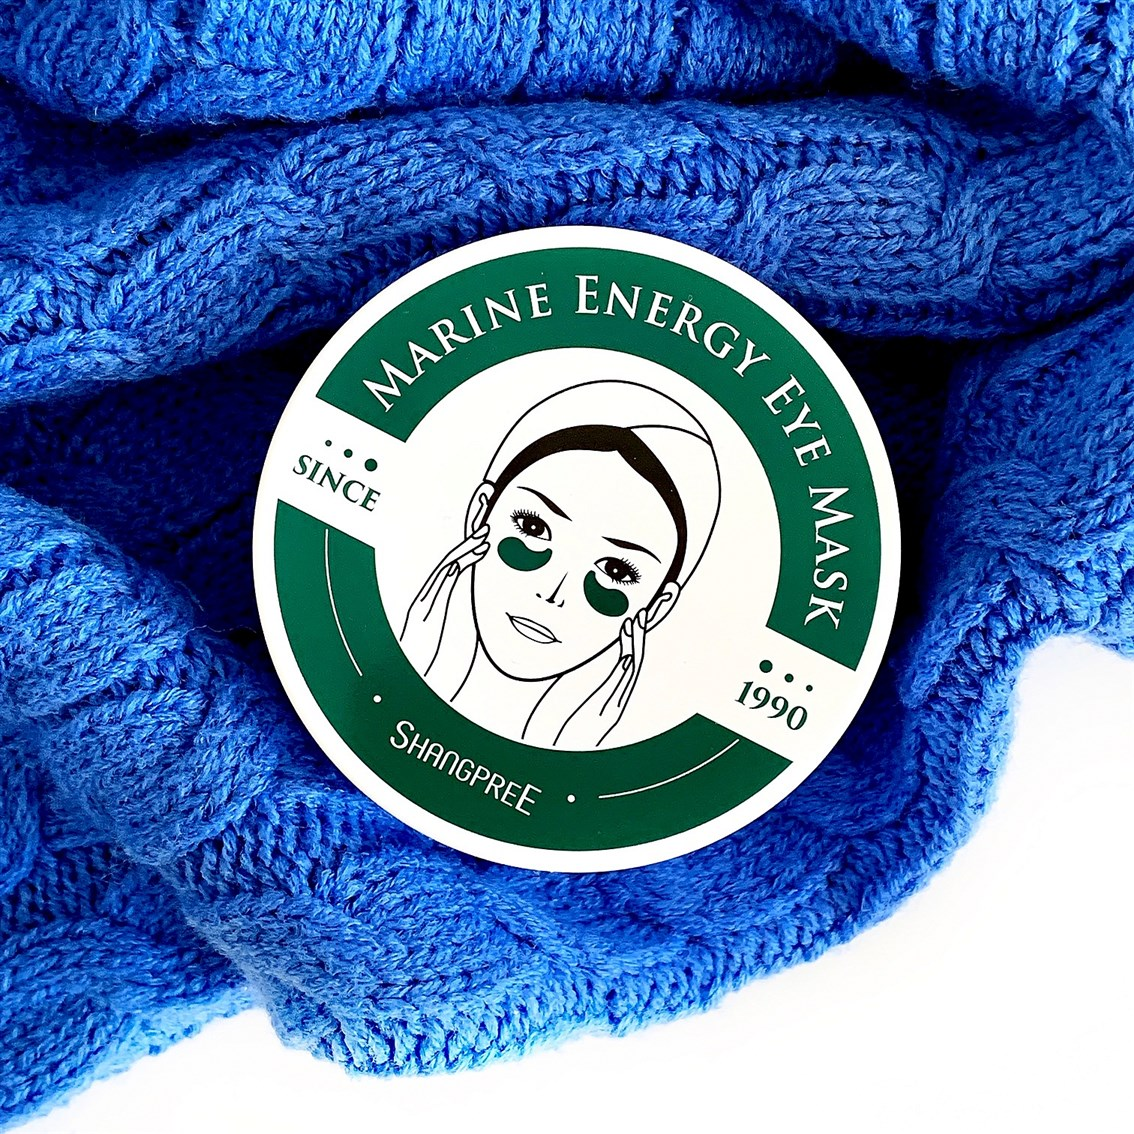 Shangpree Marine Energy Eye Mask opinie blog recenzja